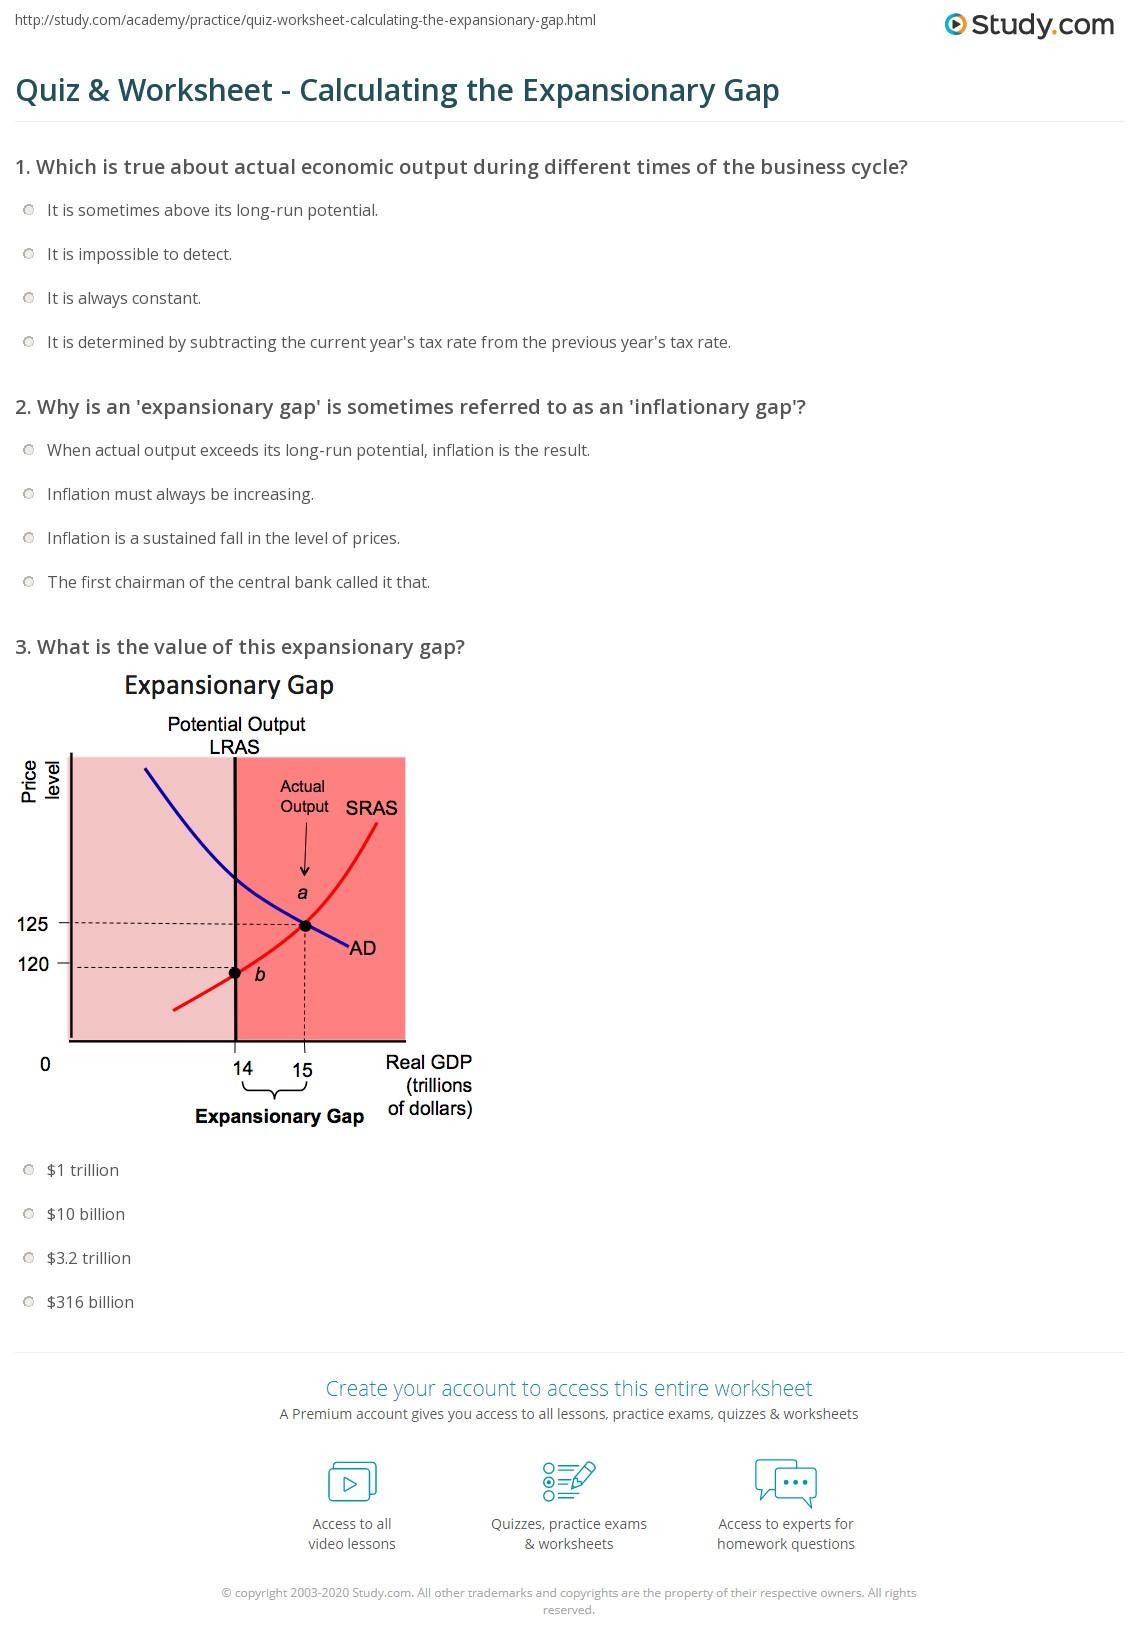 quiz worksheet calculating the expansionary gap. Black Bedroom Furniture Sets. Home Design Ideas